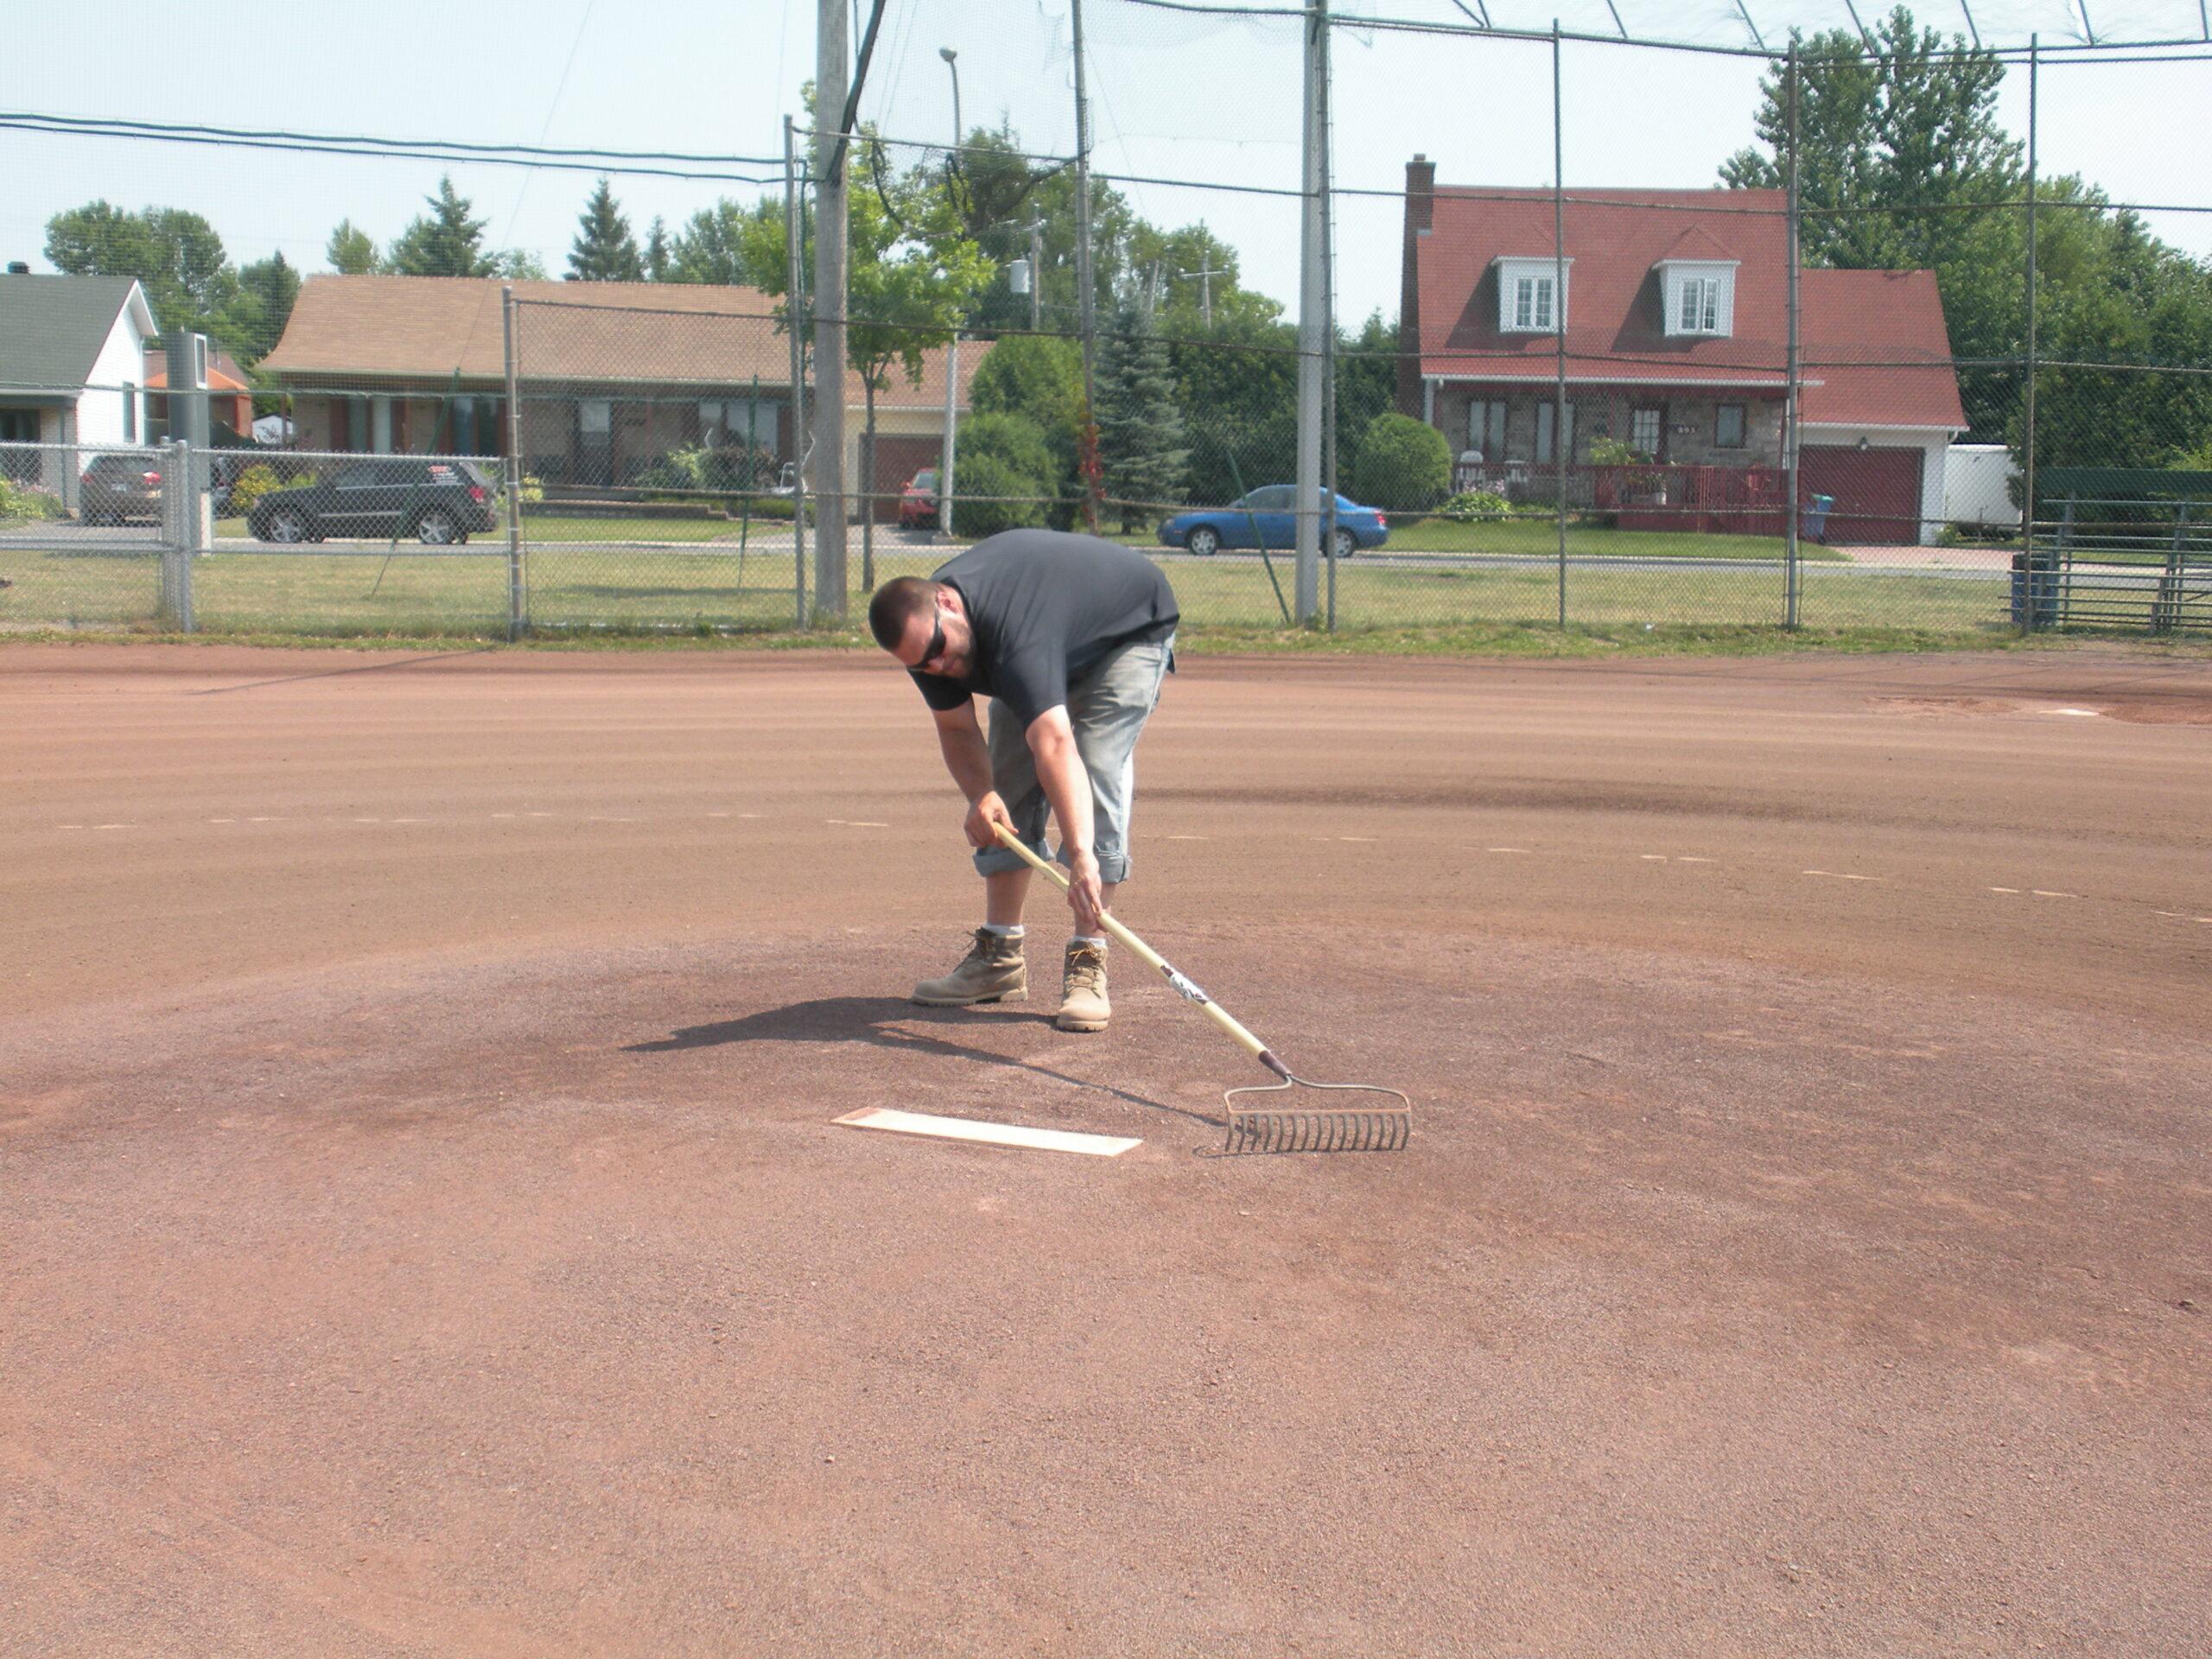 travailleur sur terrain de baseball